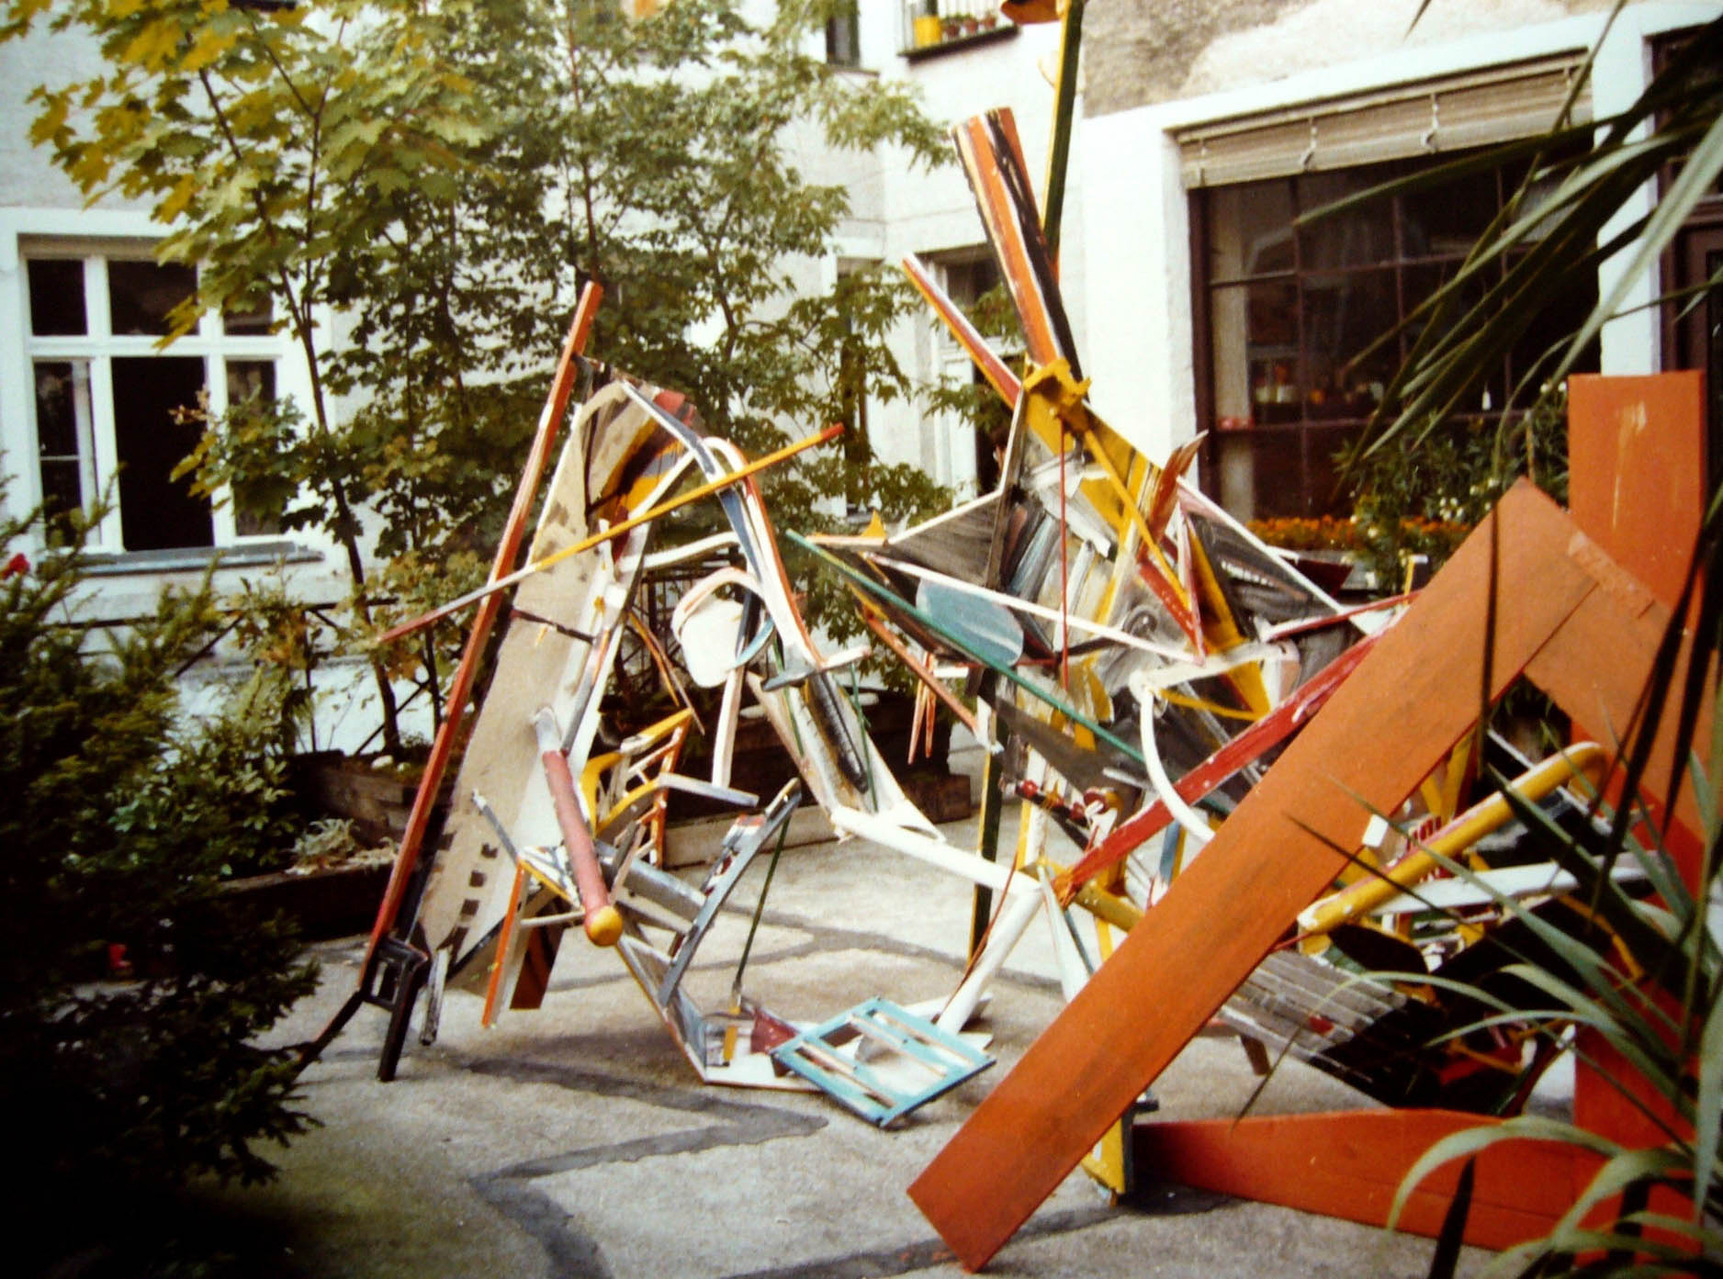 Bildraumobjekte, Kollektiv Herzogstrasse